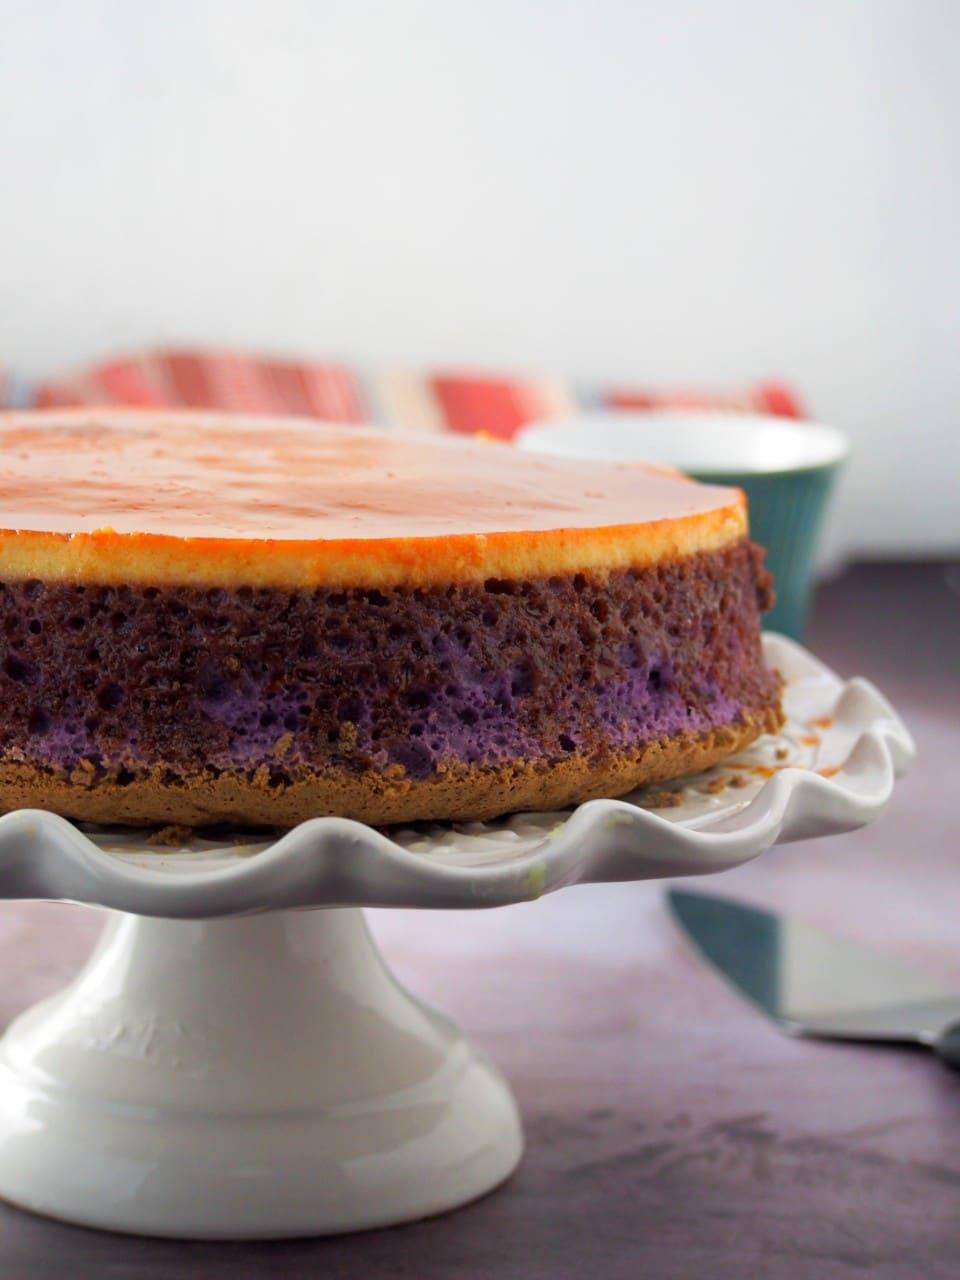 Ube Flan cake on a cake stand.